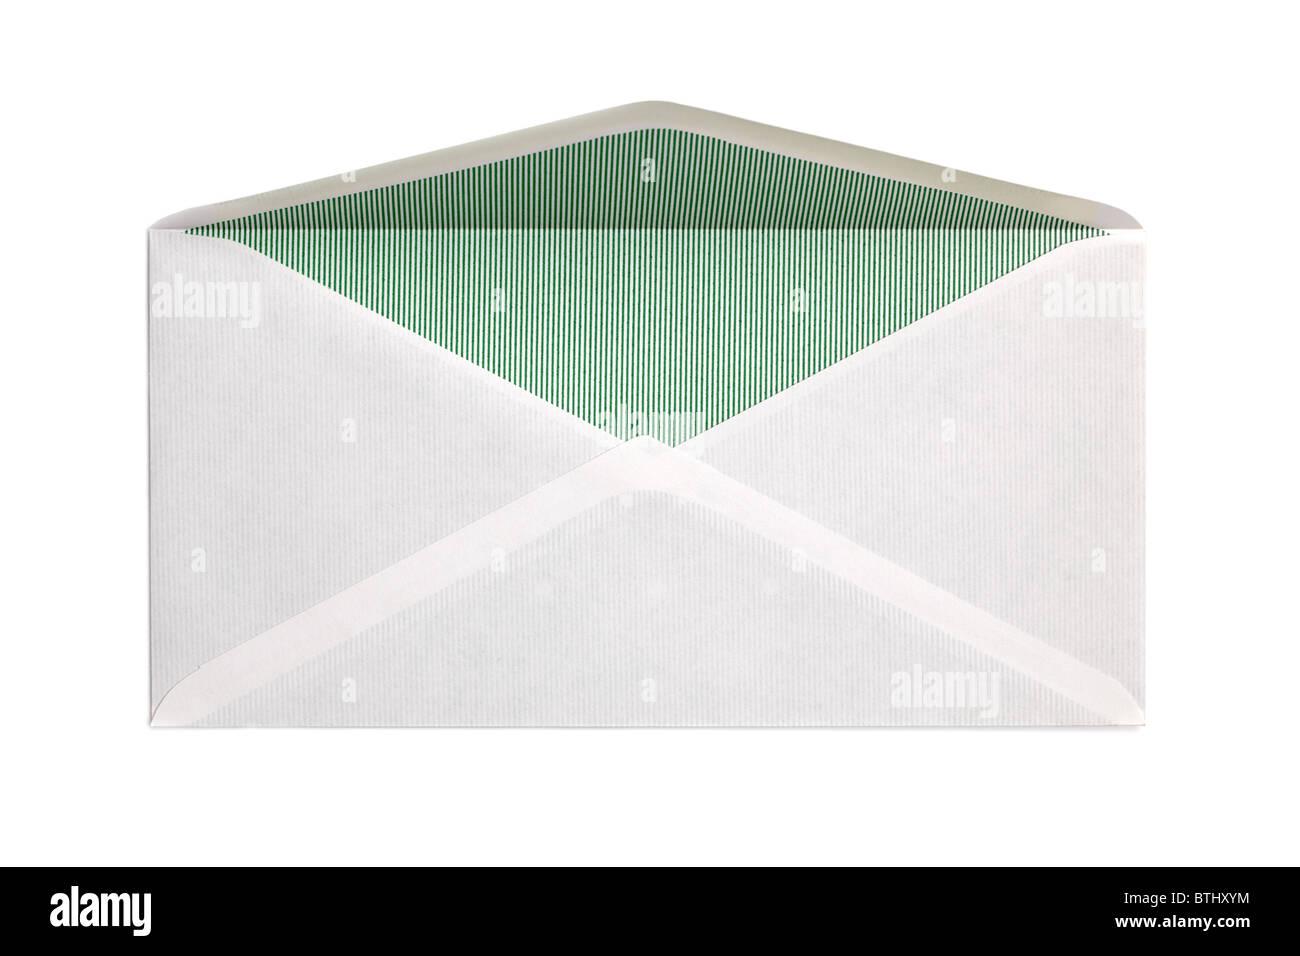 Blank open envelope - Stock Image